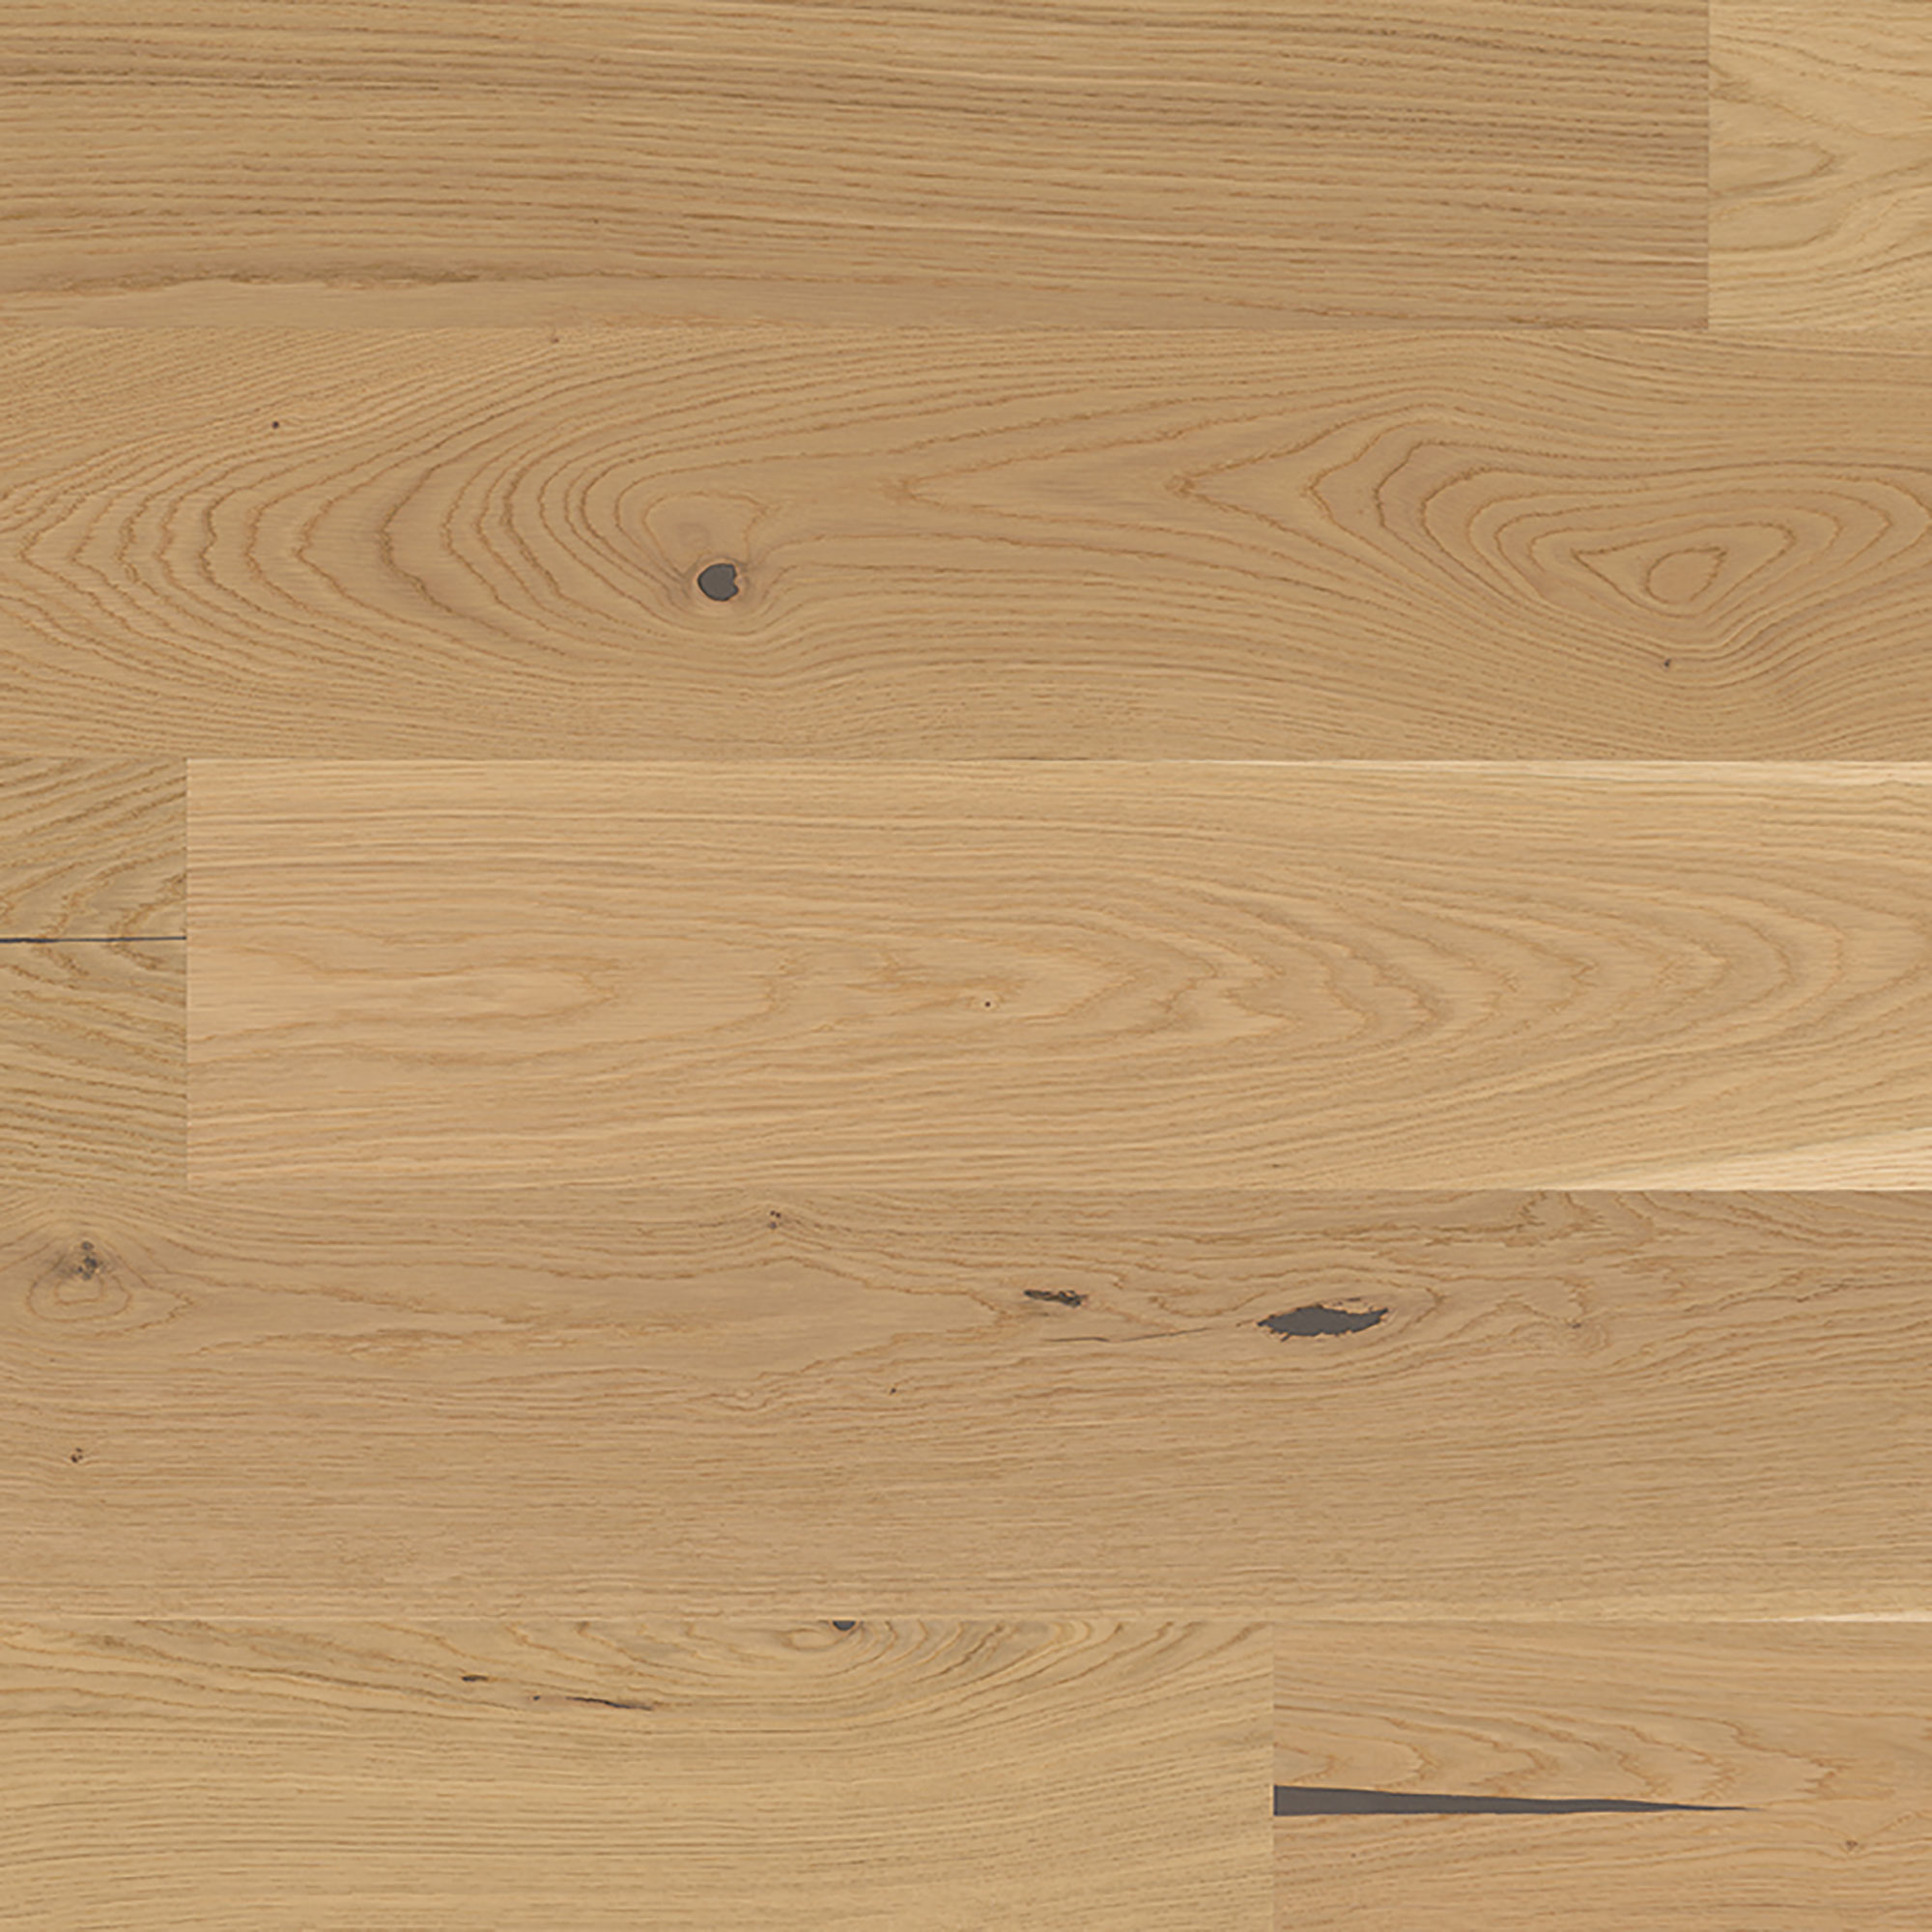 Trägolv Bjelin Parkett Ek Plank 200 Country Mattlack Vit OP Dugi 15,5